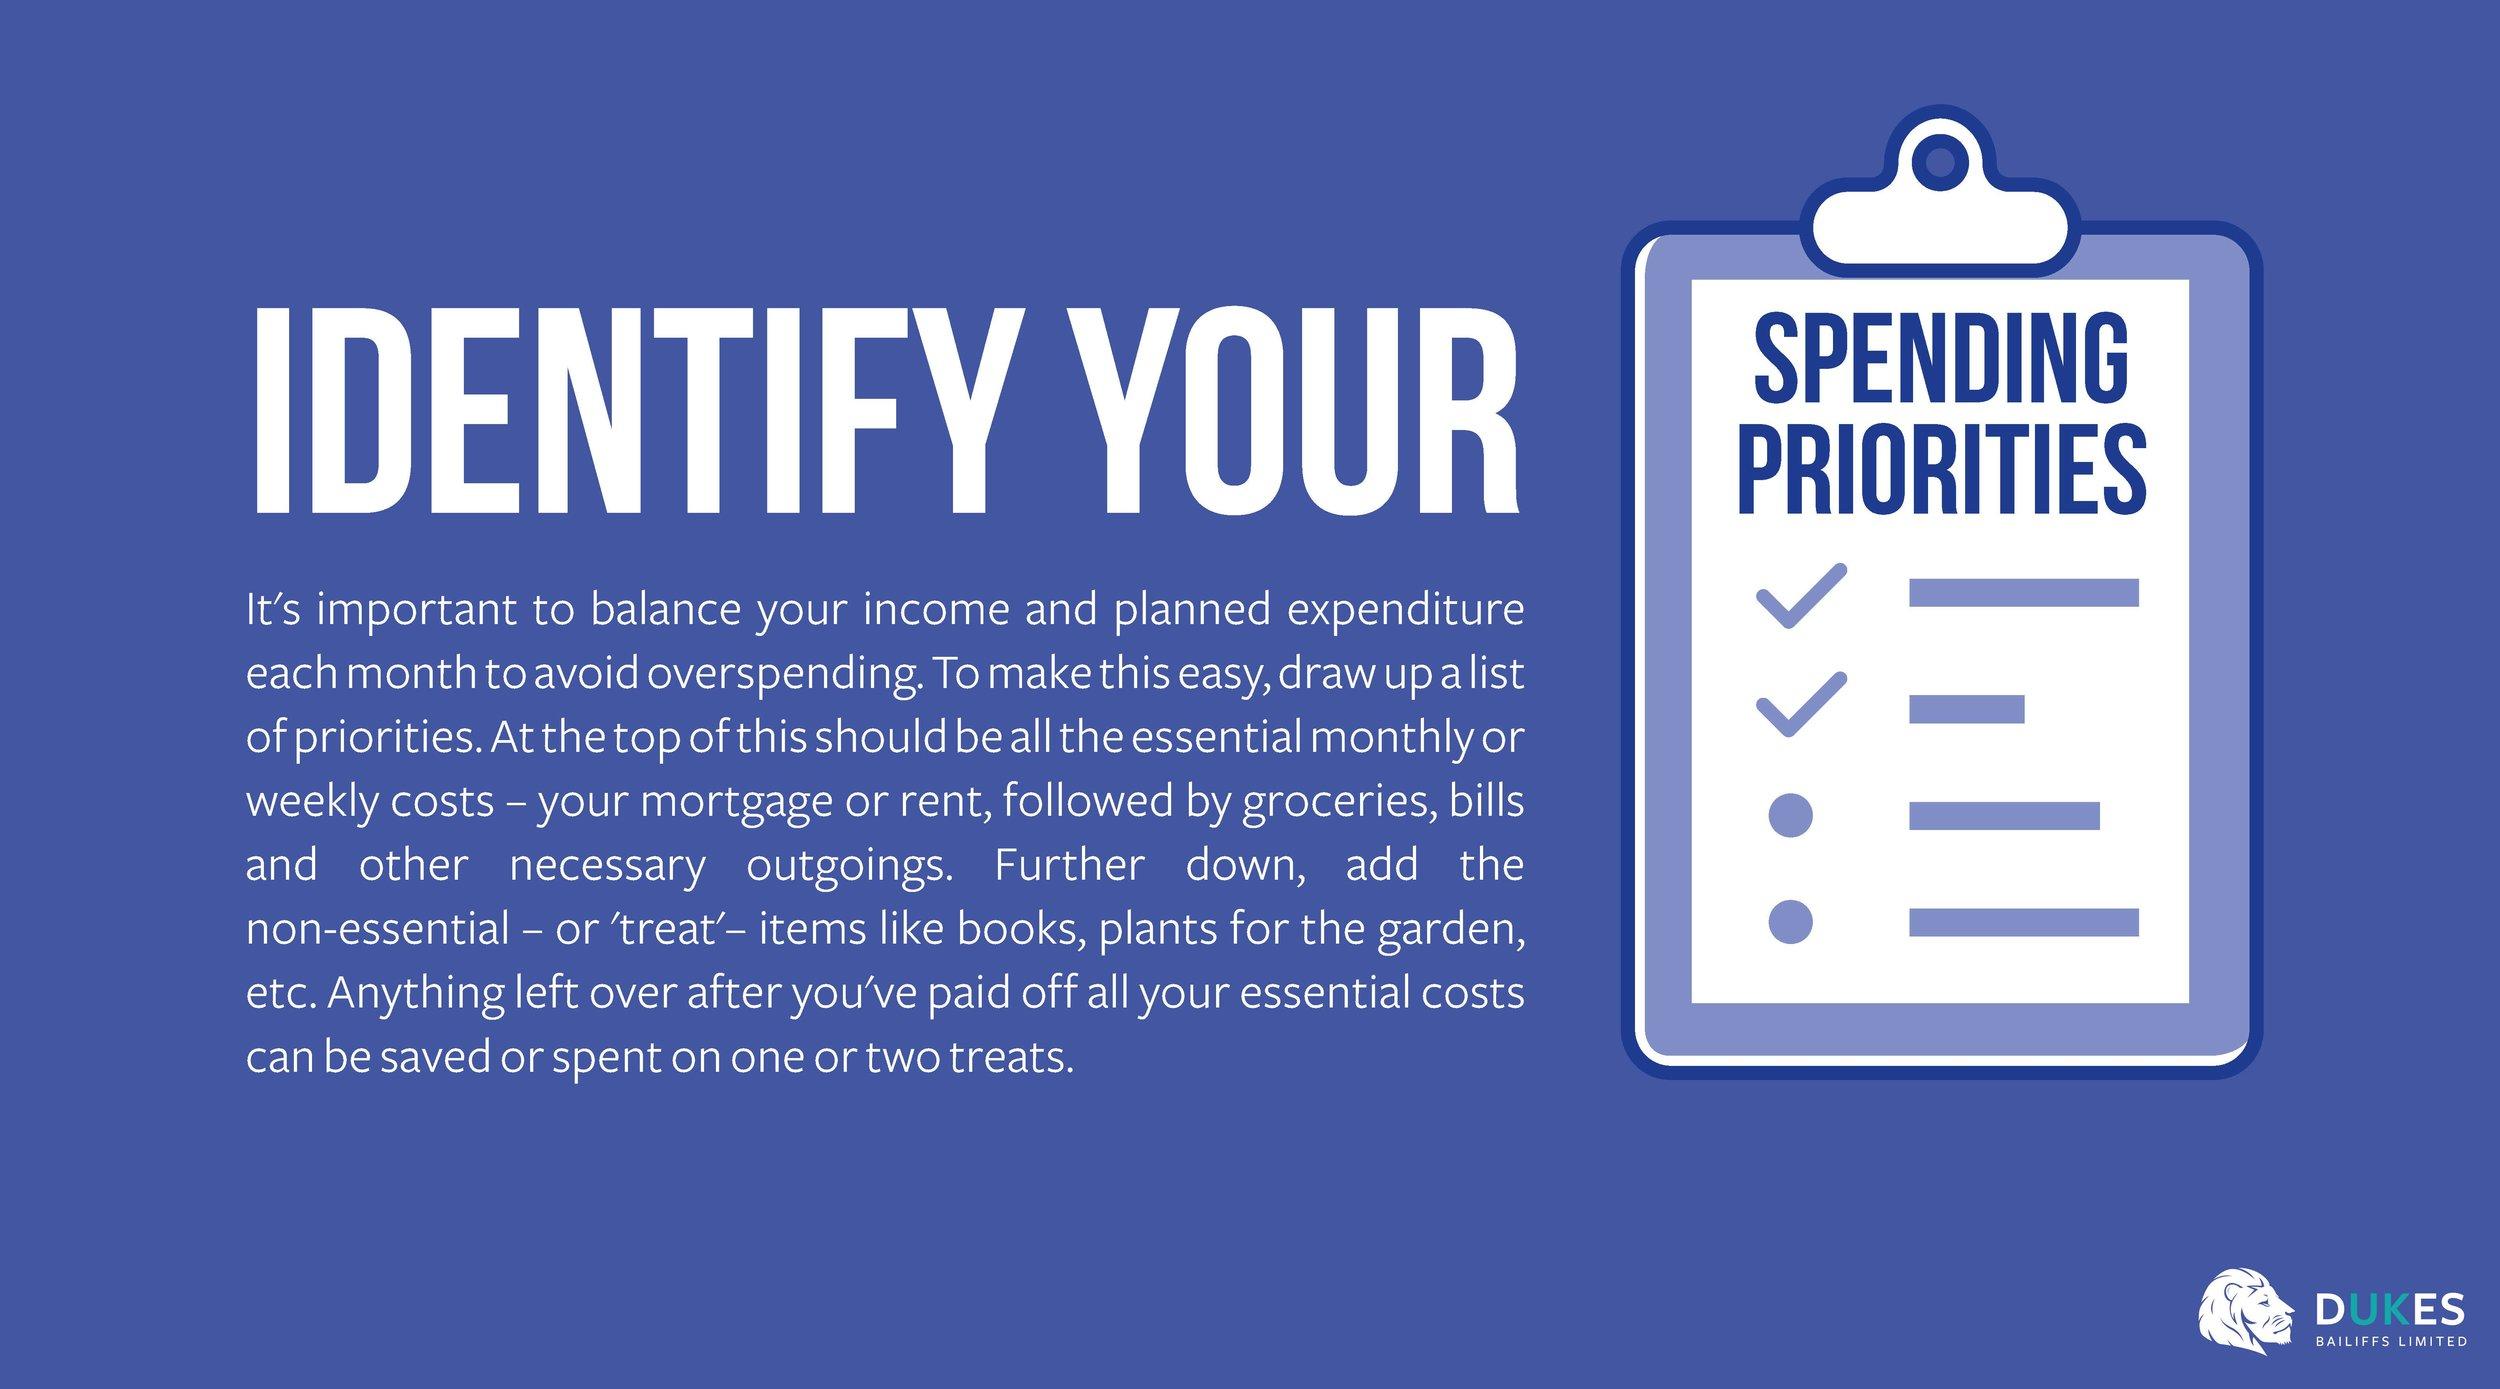 5. Identify your spending priorities - Dukes.jpg